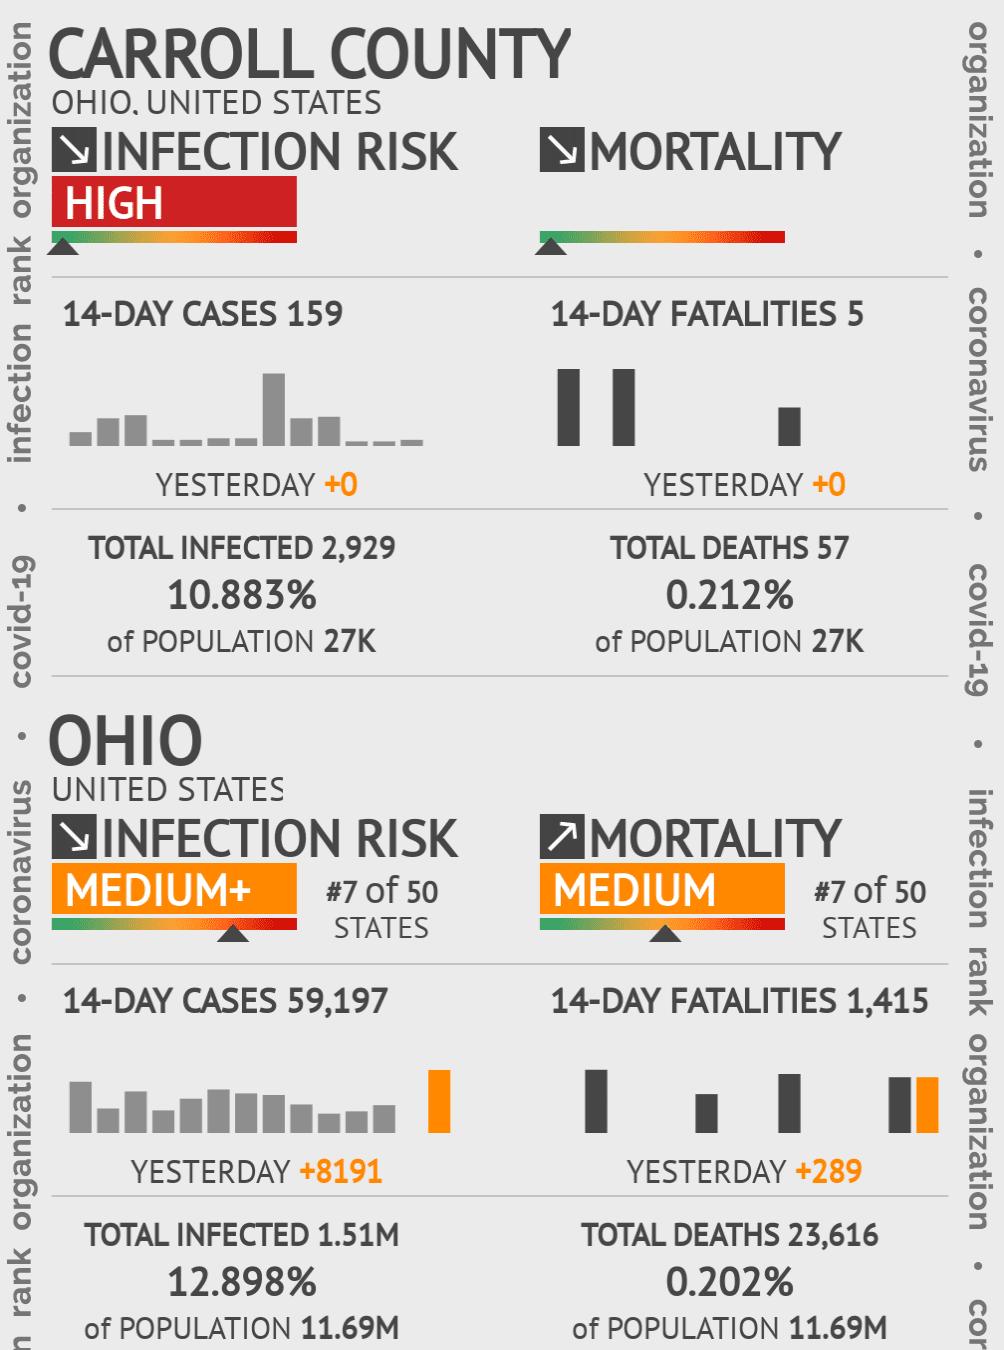 Carroll County Coronavirus Covid-19 Risk of Infection on July 24, 2021